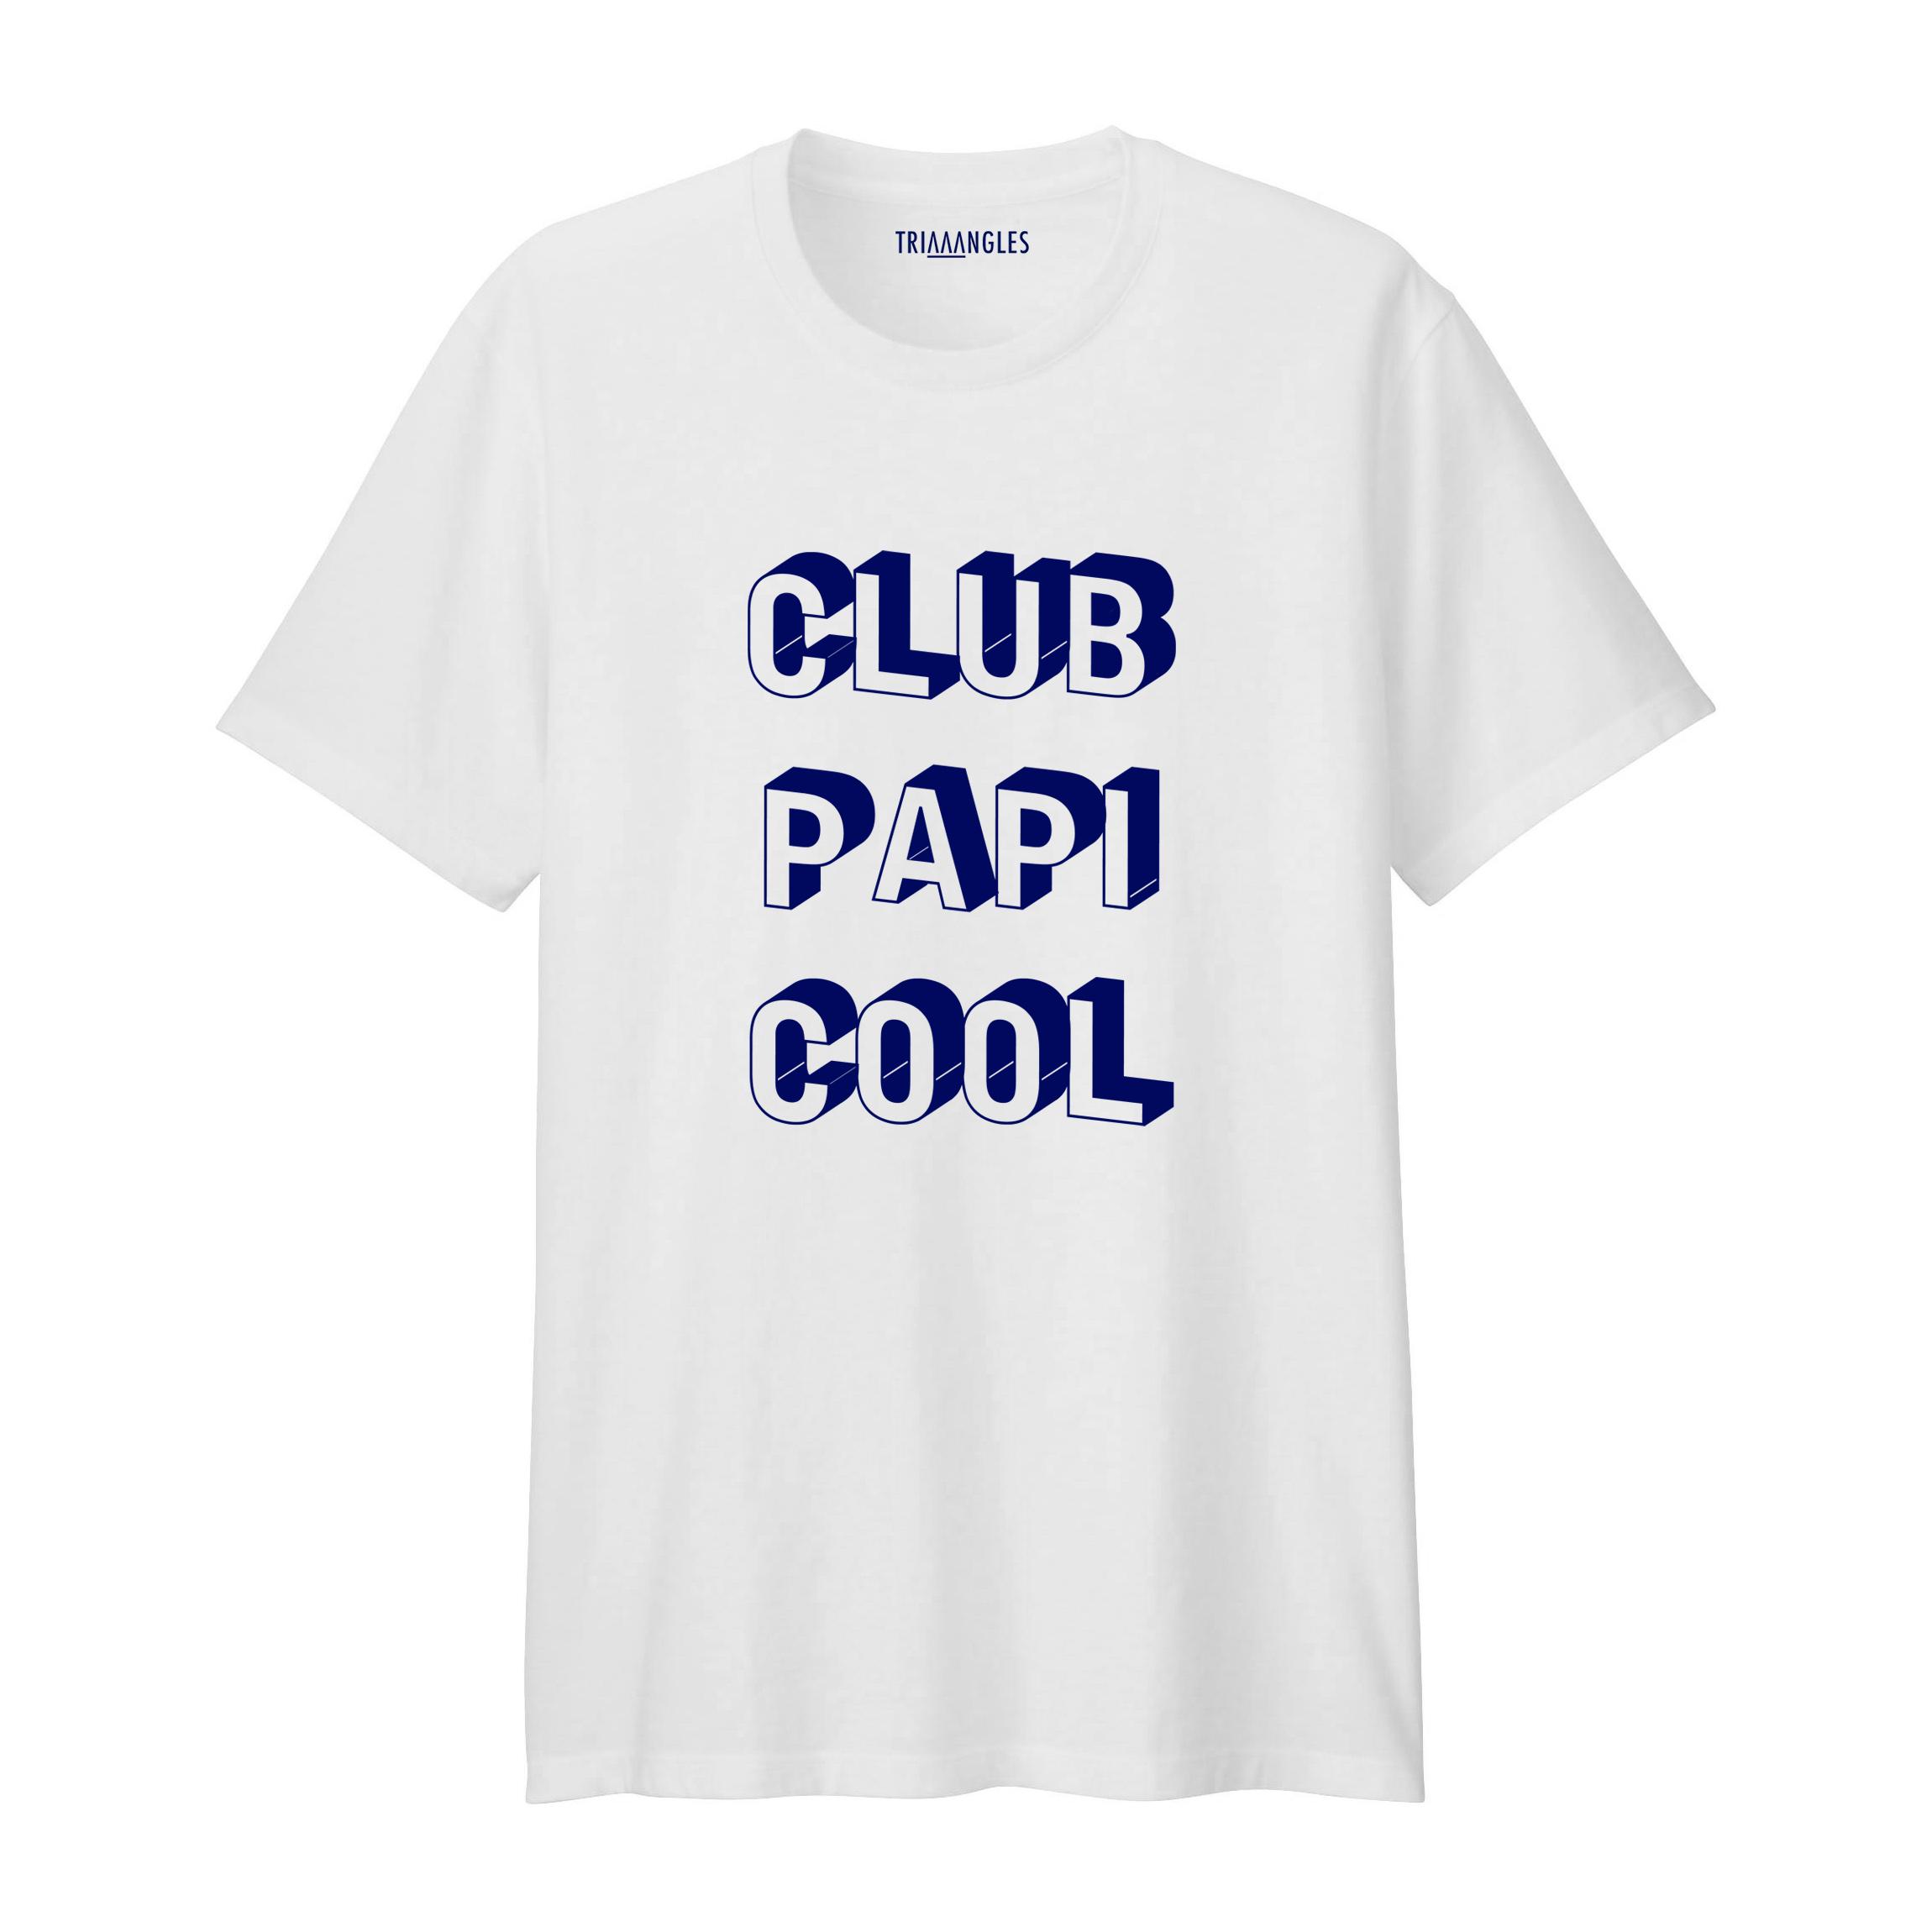 Tshirt Blanc Club Papi Cool - Coupe Homme - Artshop Triaaangles ® SiSi La Famille